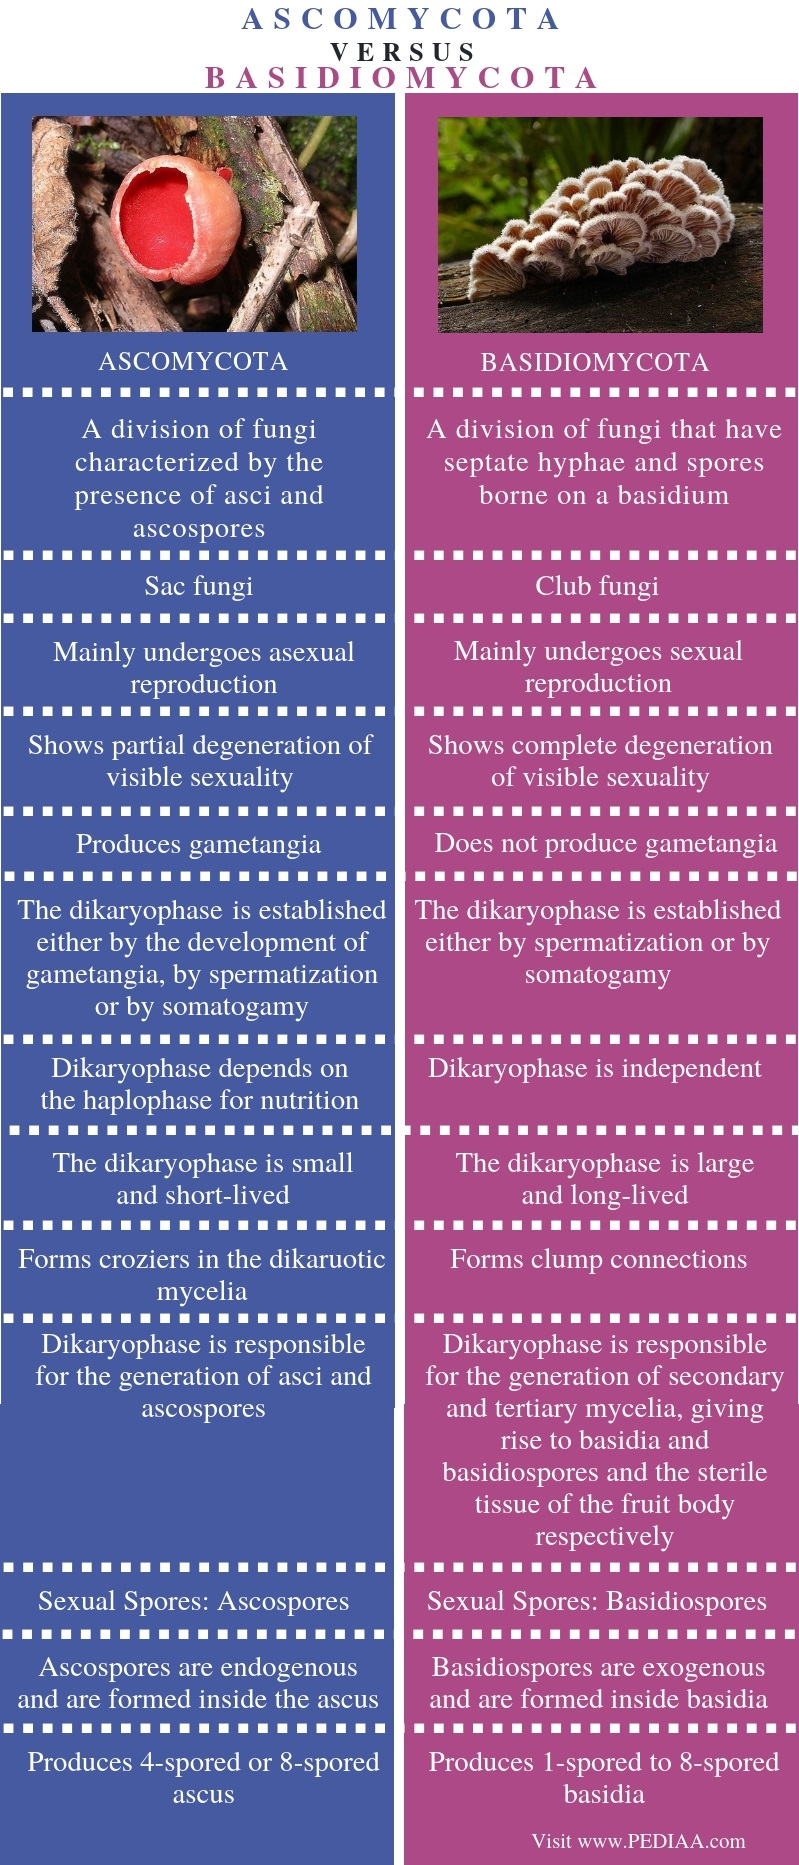 Difference Between Ascomycota and Basidiomycota - Comparison Summary